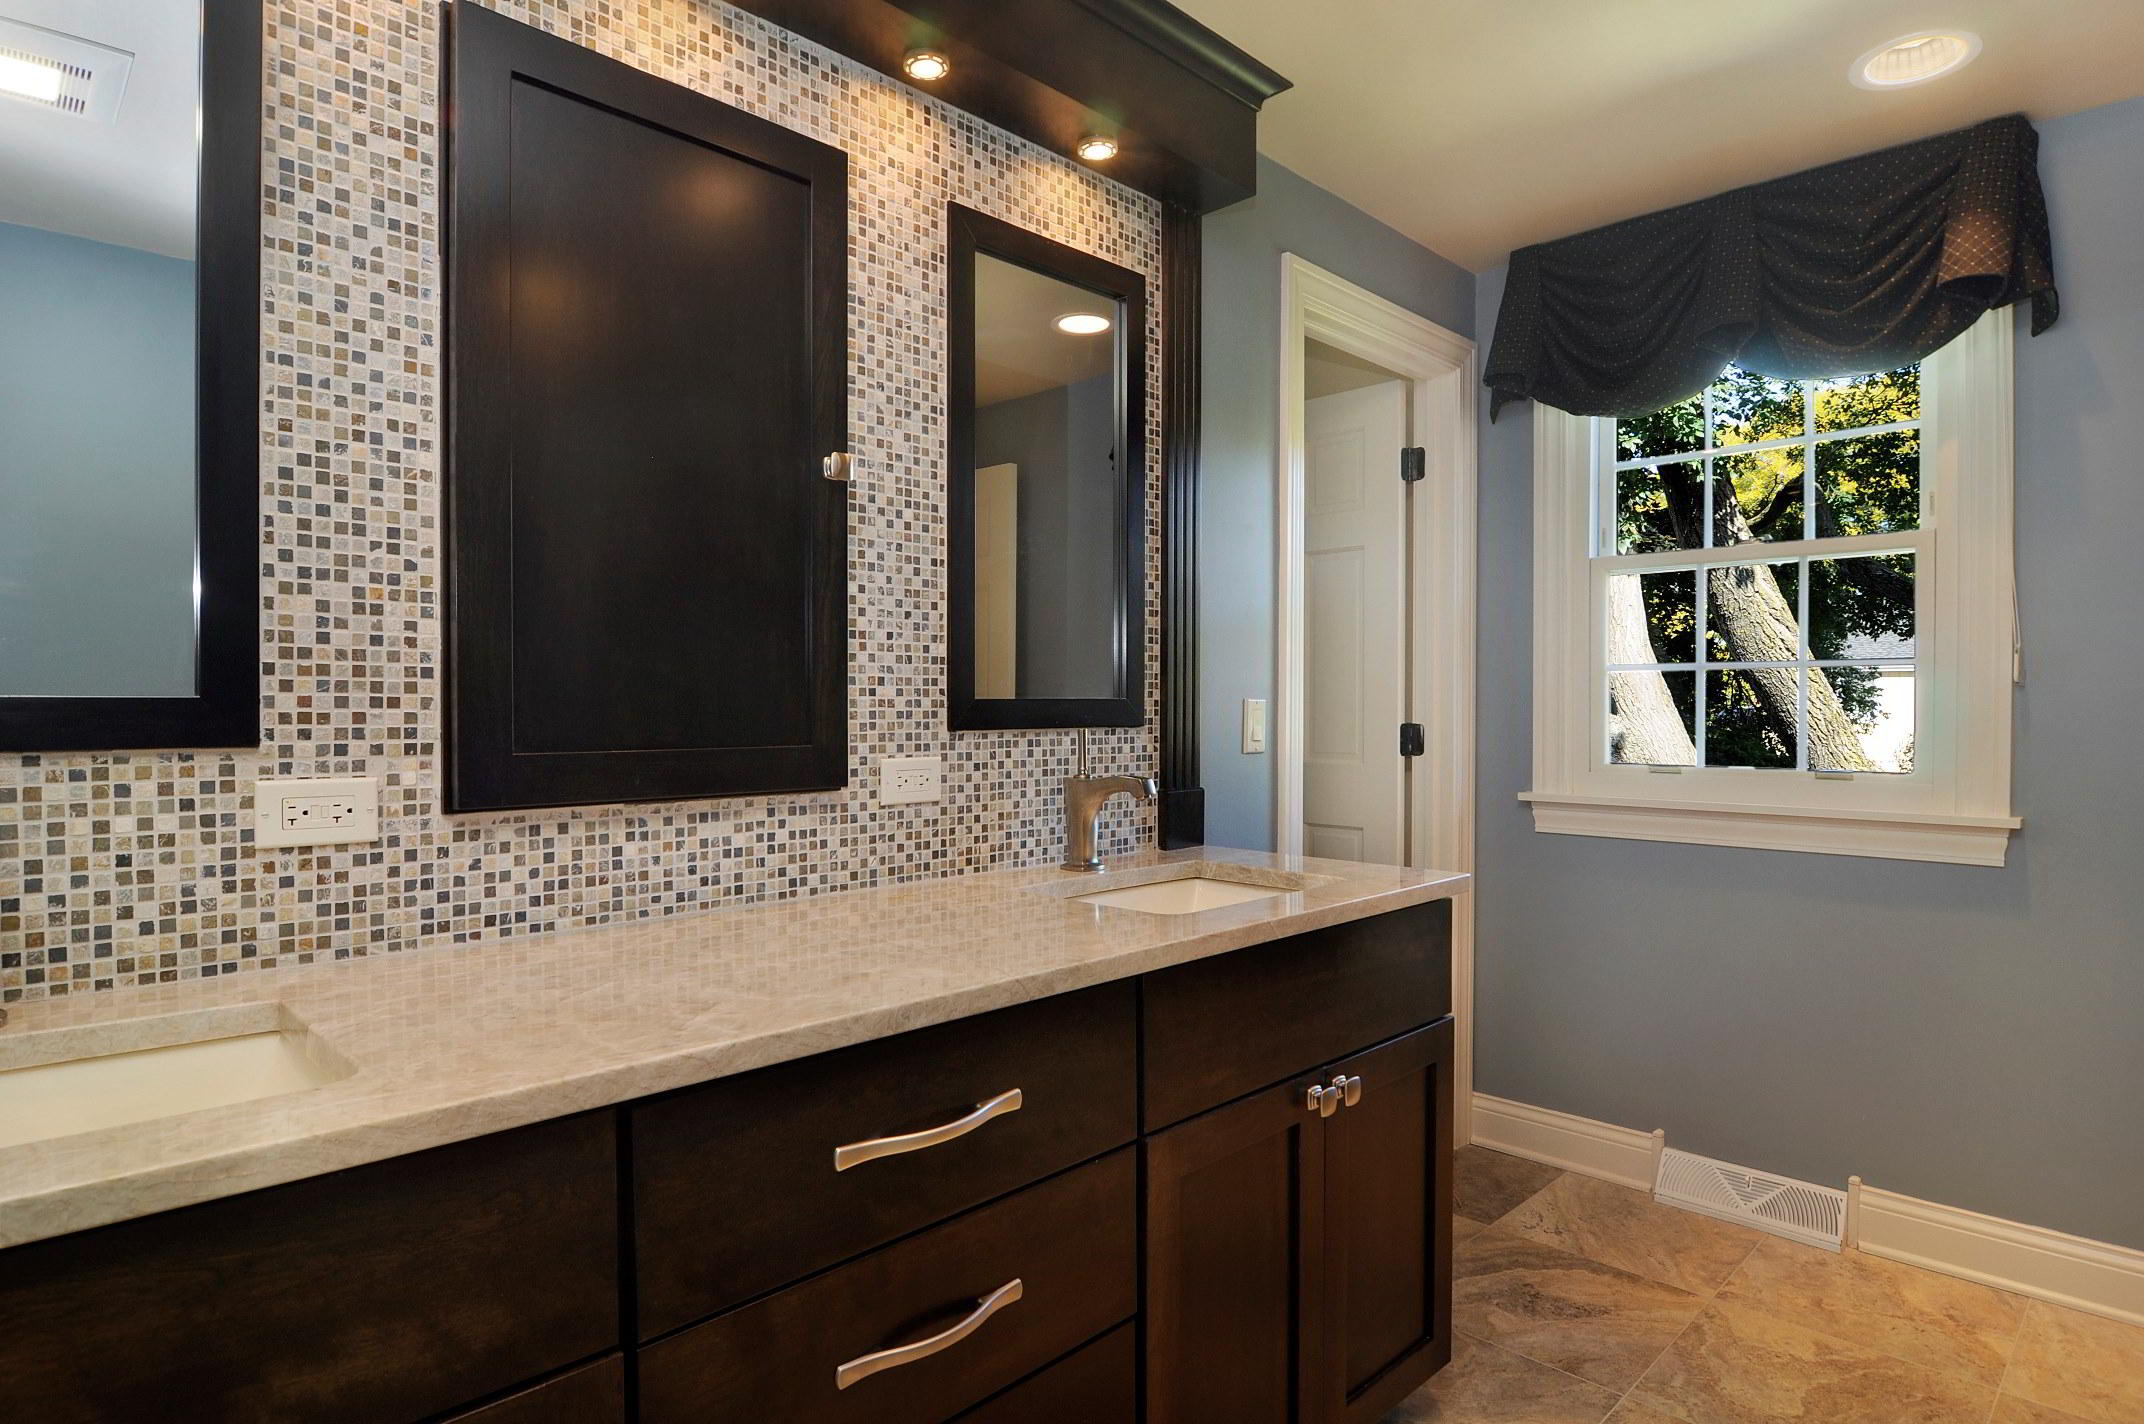 bathrooms expert friendly interior designer df design inc master bathroom interior design and remodeling